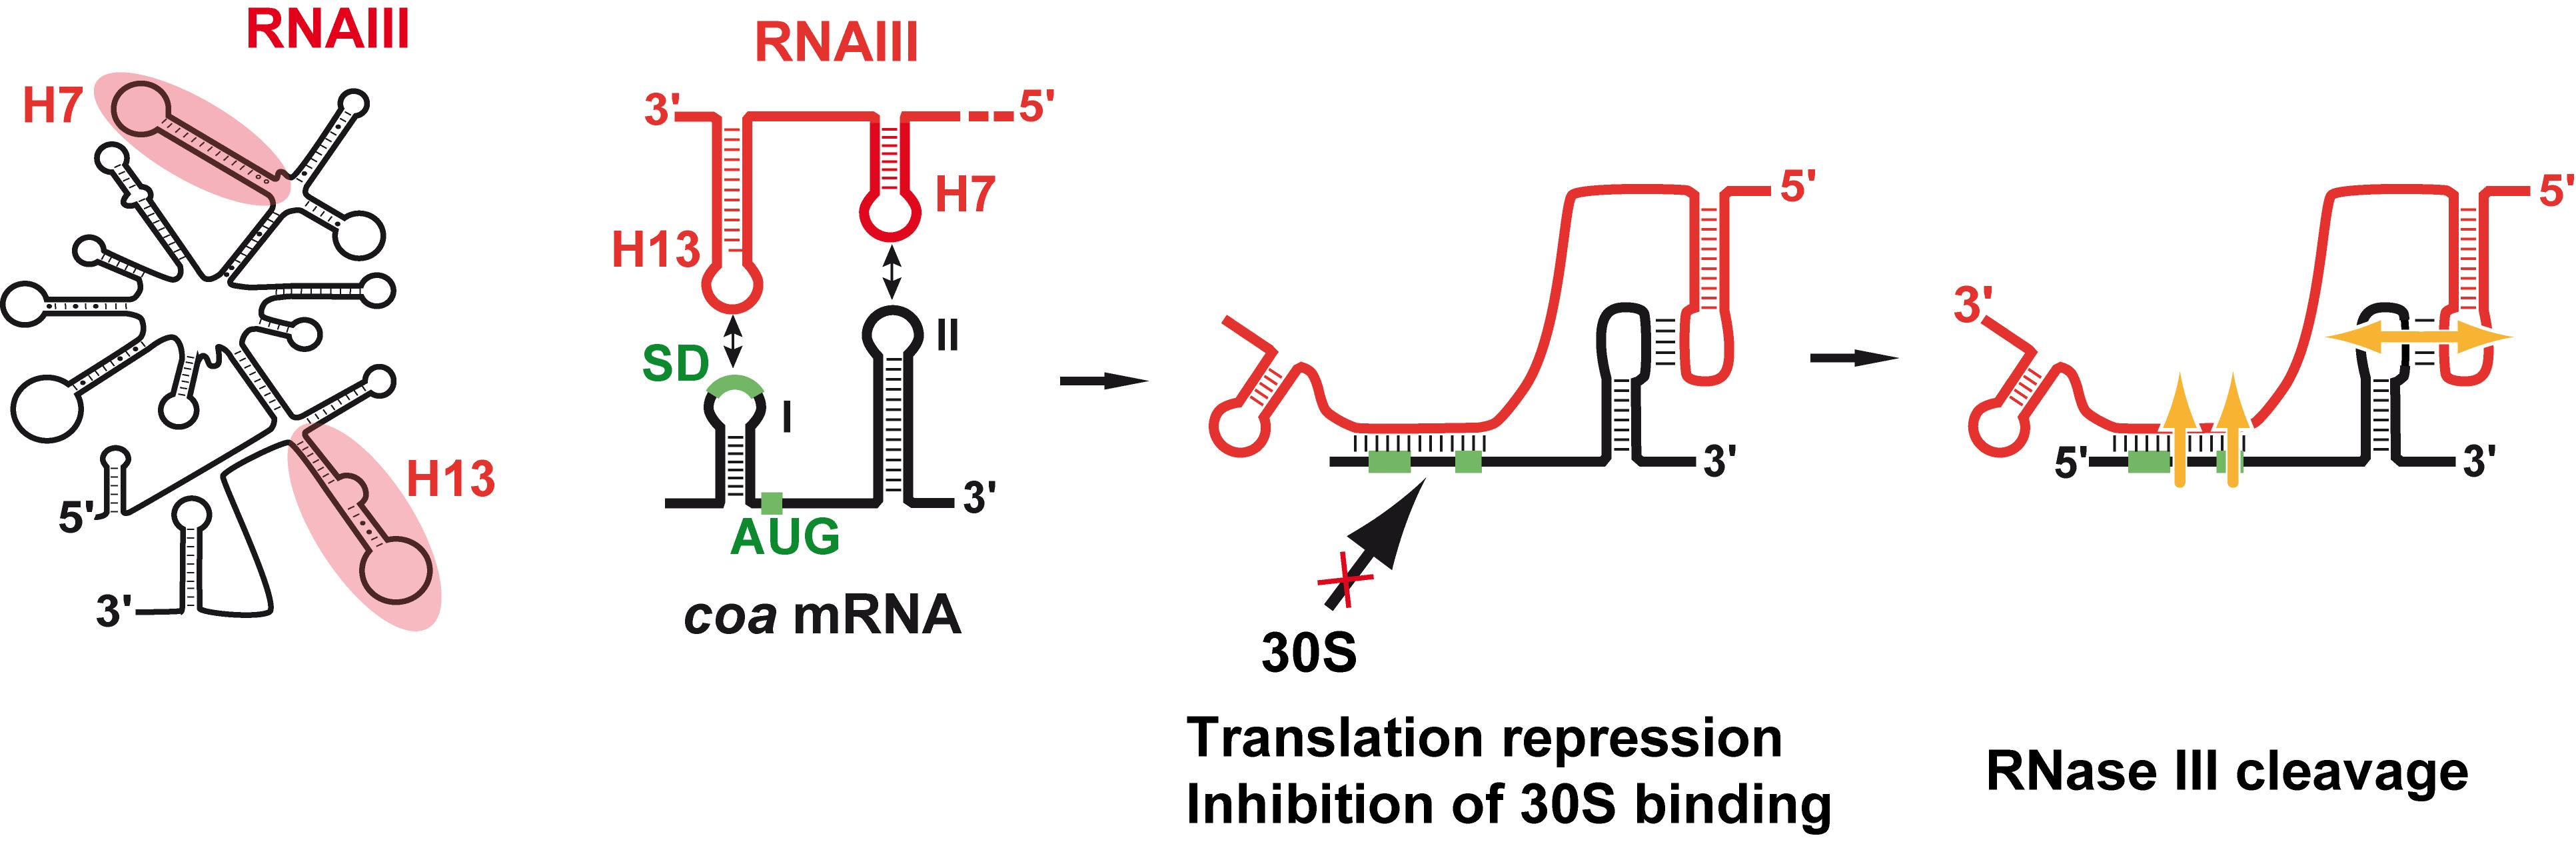 Schematic view of RNAIII-mediated repression of <i>coa</i> mRNA.